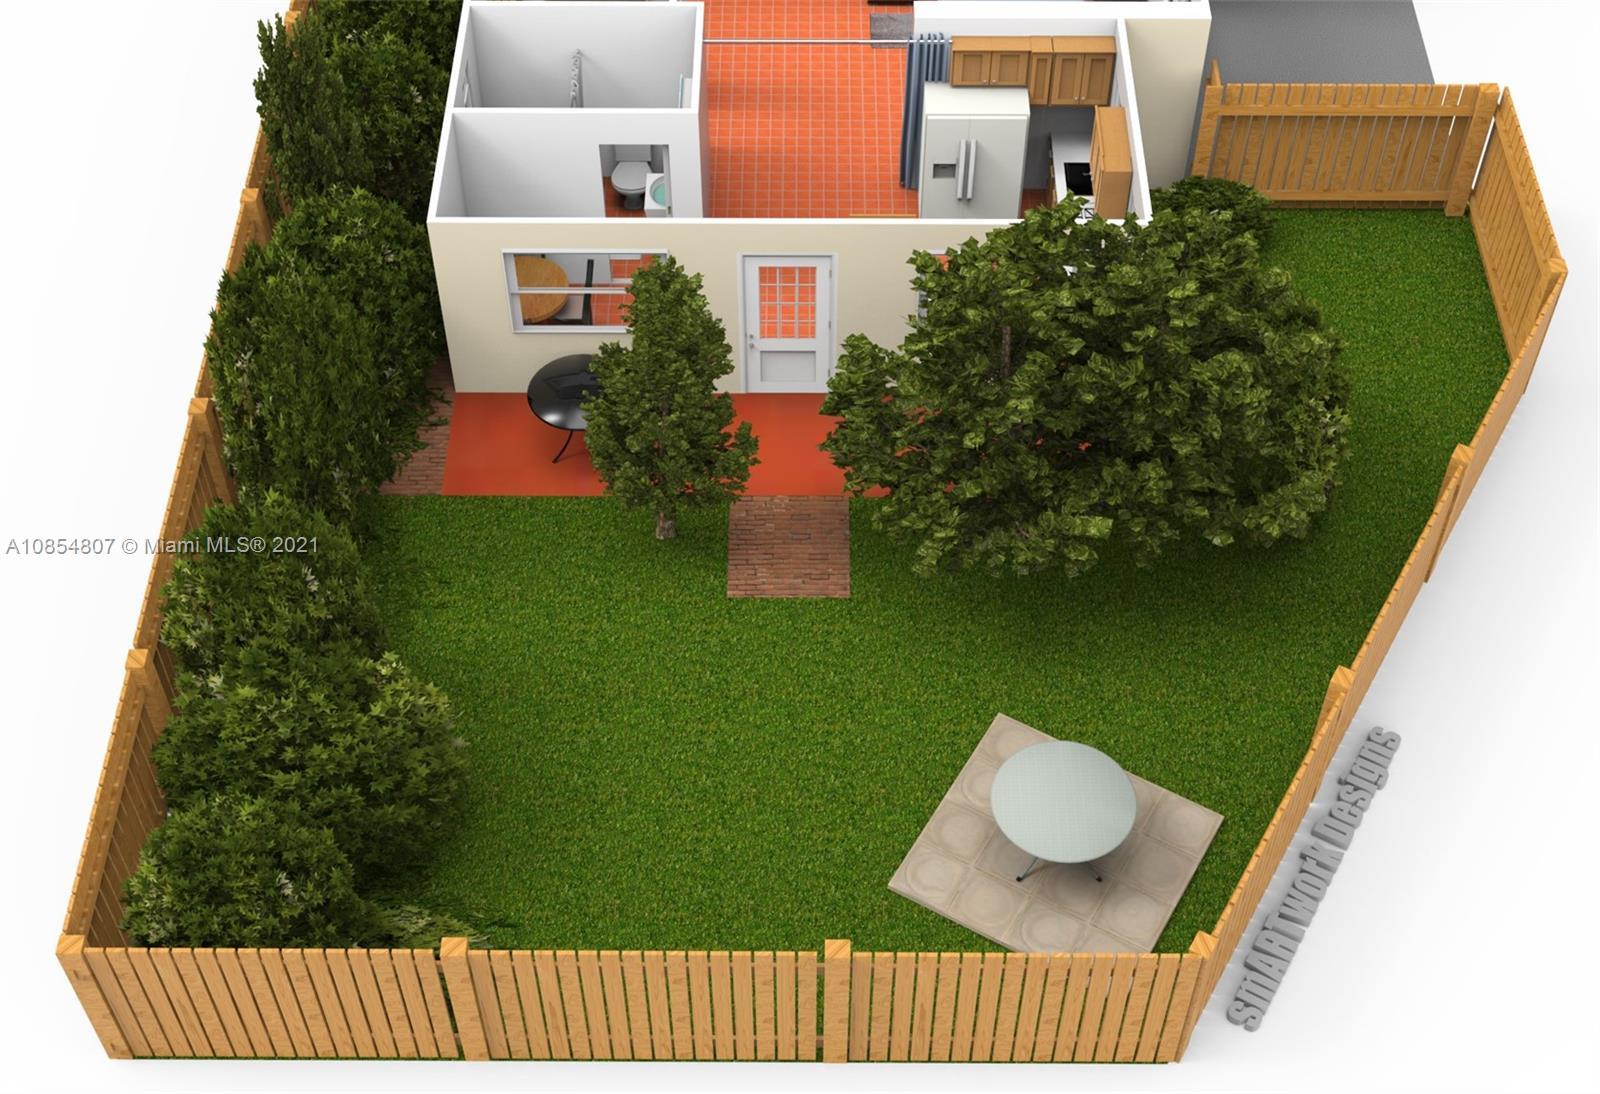 Efficiency floor plan with private backyard.